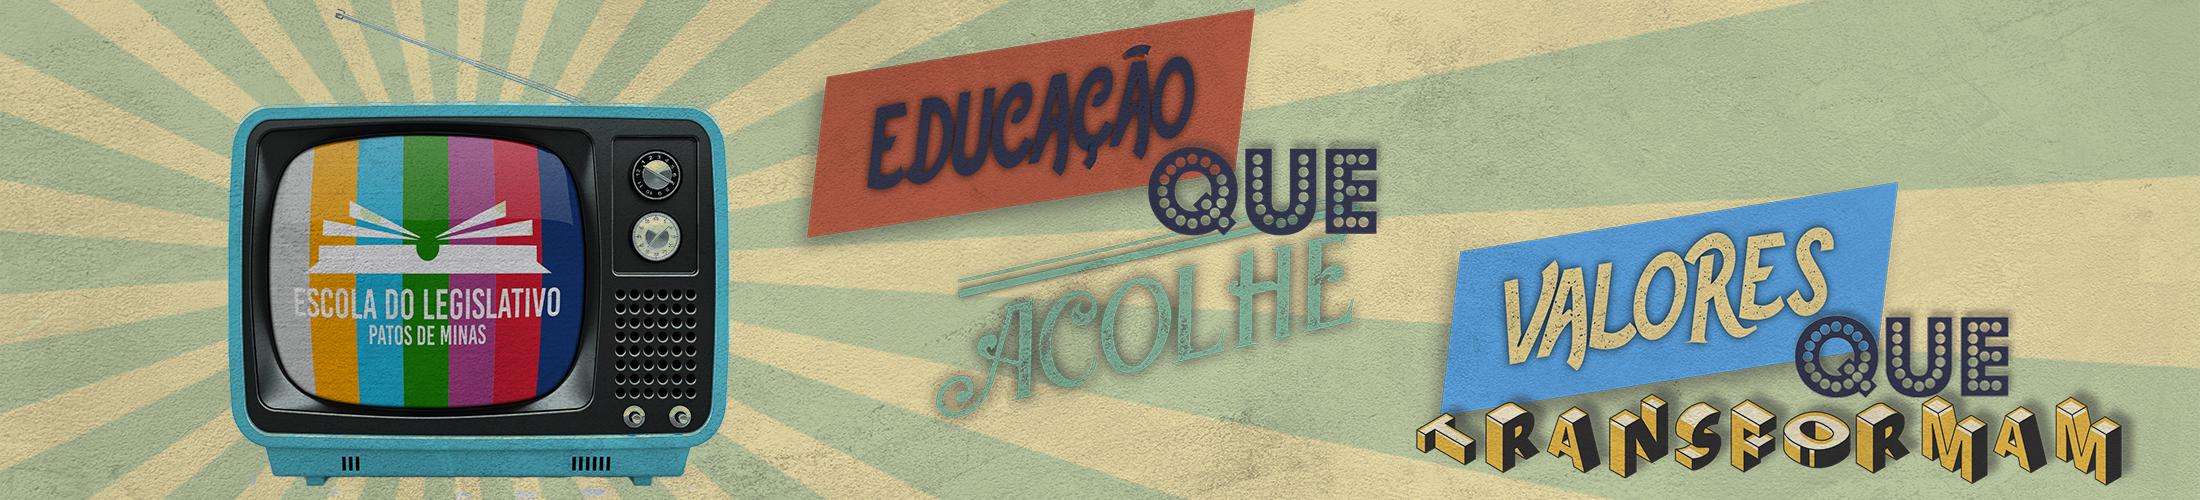 Banner_Escola_do_Legislativo